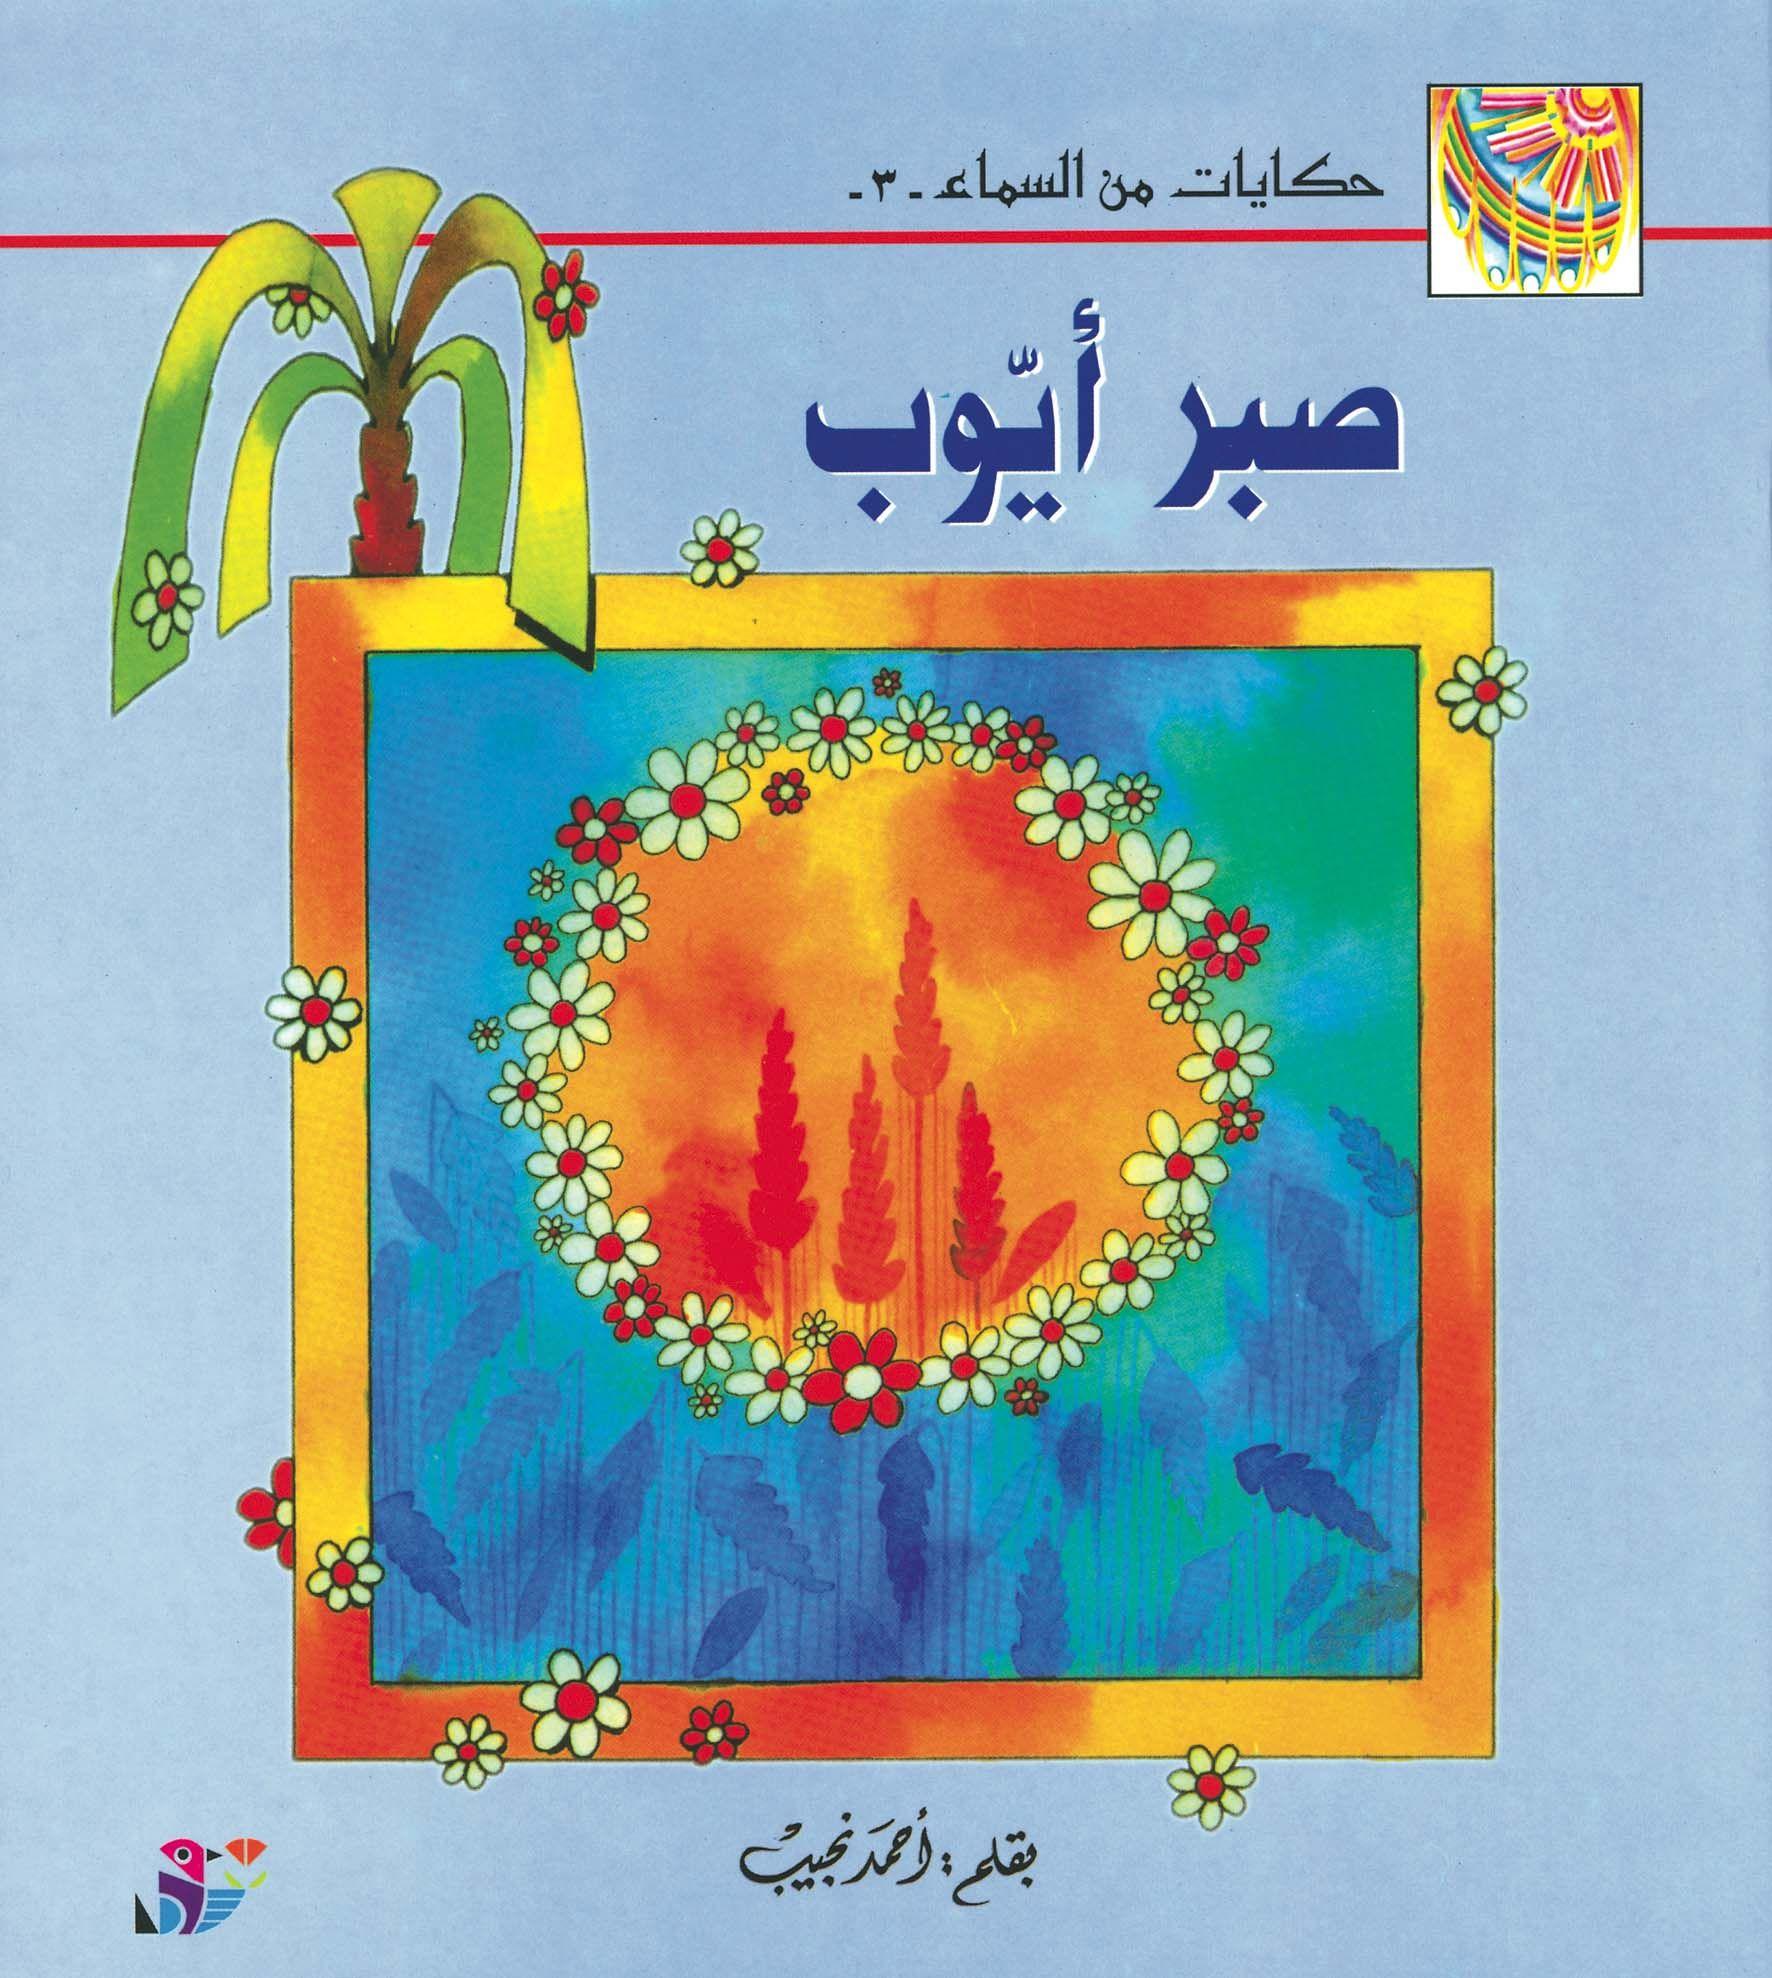 إن ها قصة النبي الذي ض رب المثل بصبره إنه النبي أيوب ع It Is The Story Of Prophet Ayyoub Pbuh Who Was Known For With Images Arabic Books Online Bookstore Arabic